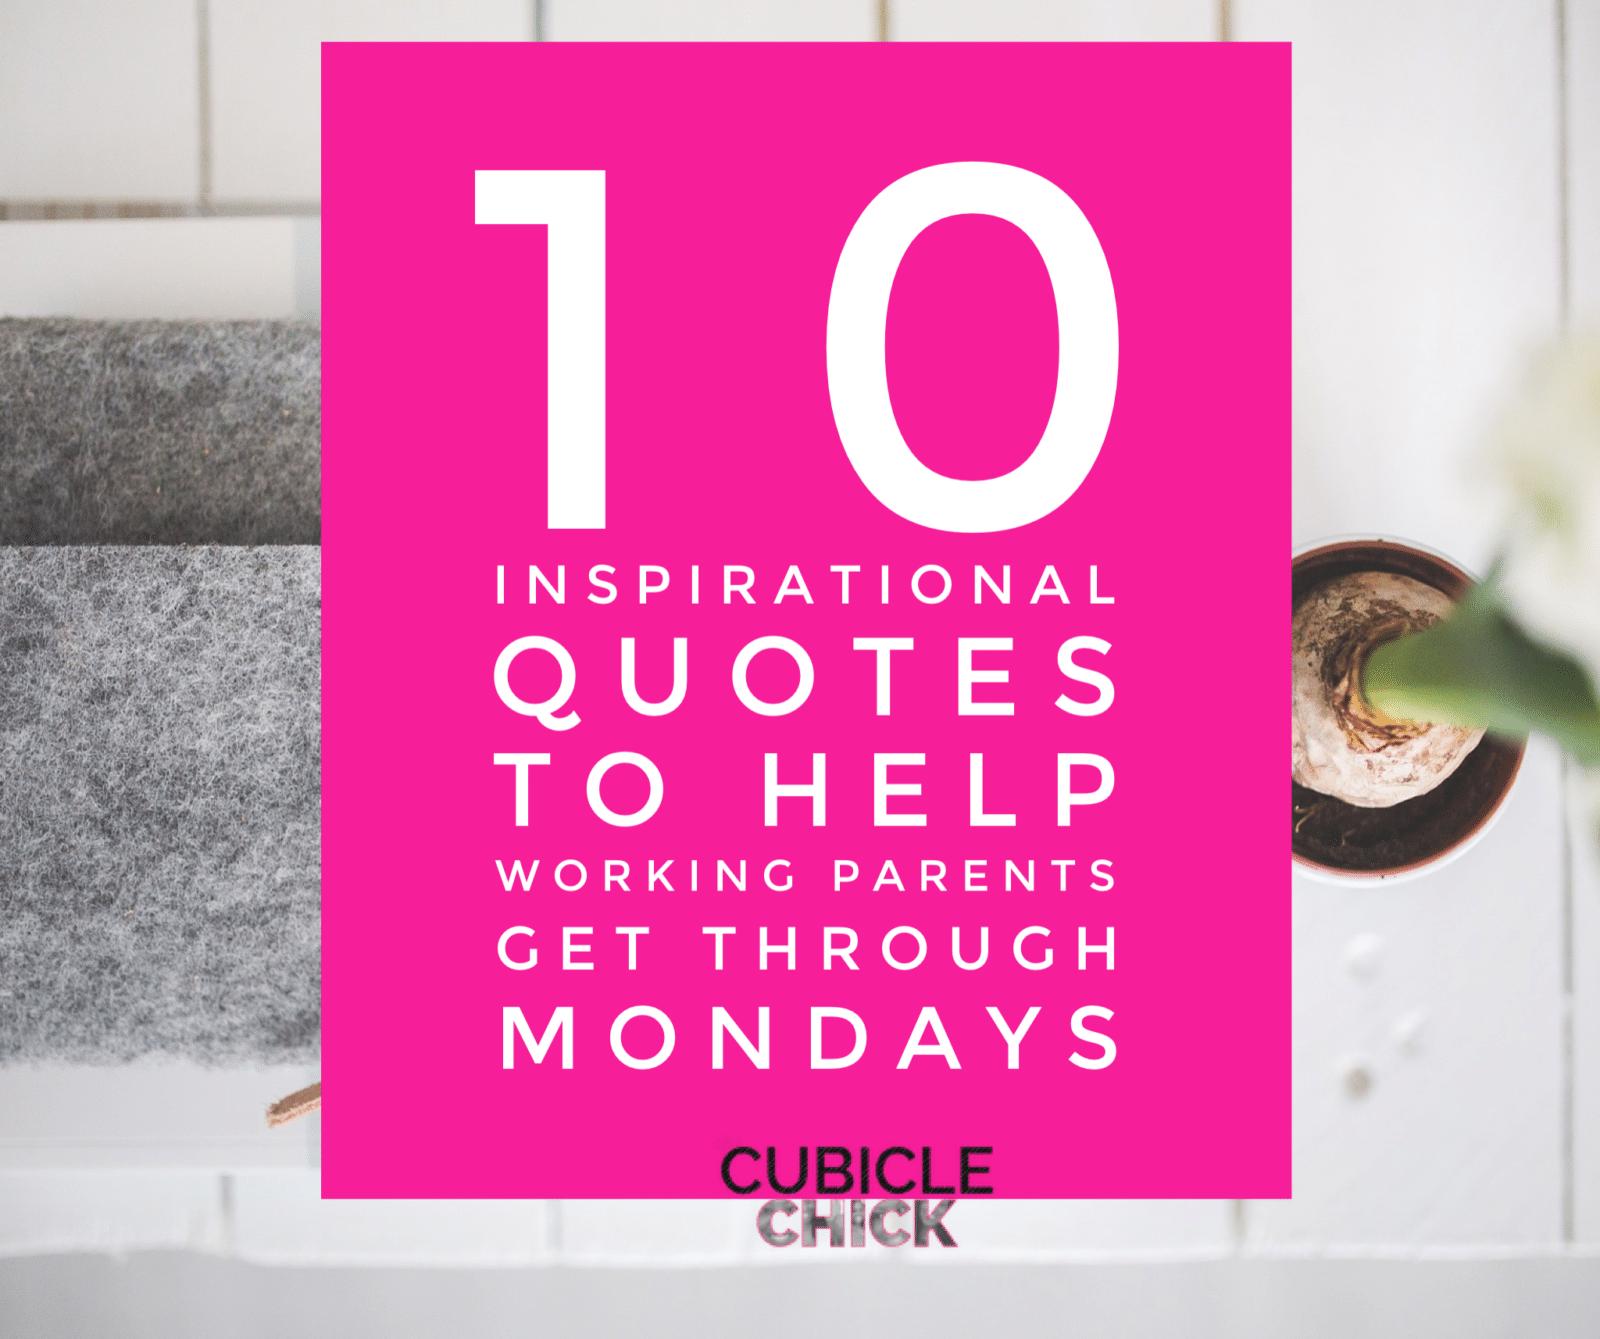 10 Inspirational Quotes to Help Working Parents Get Through Mondays